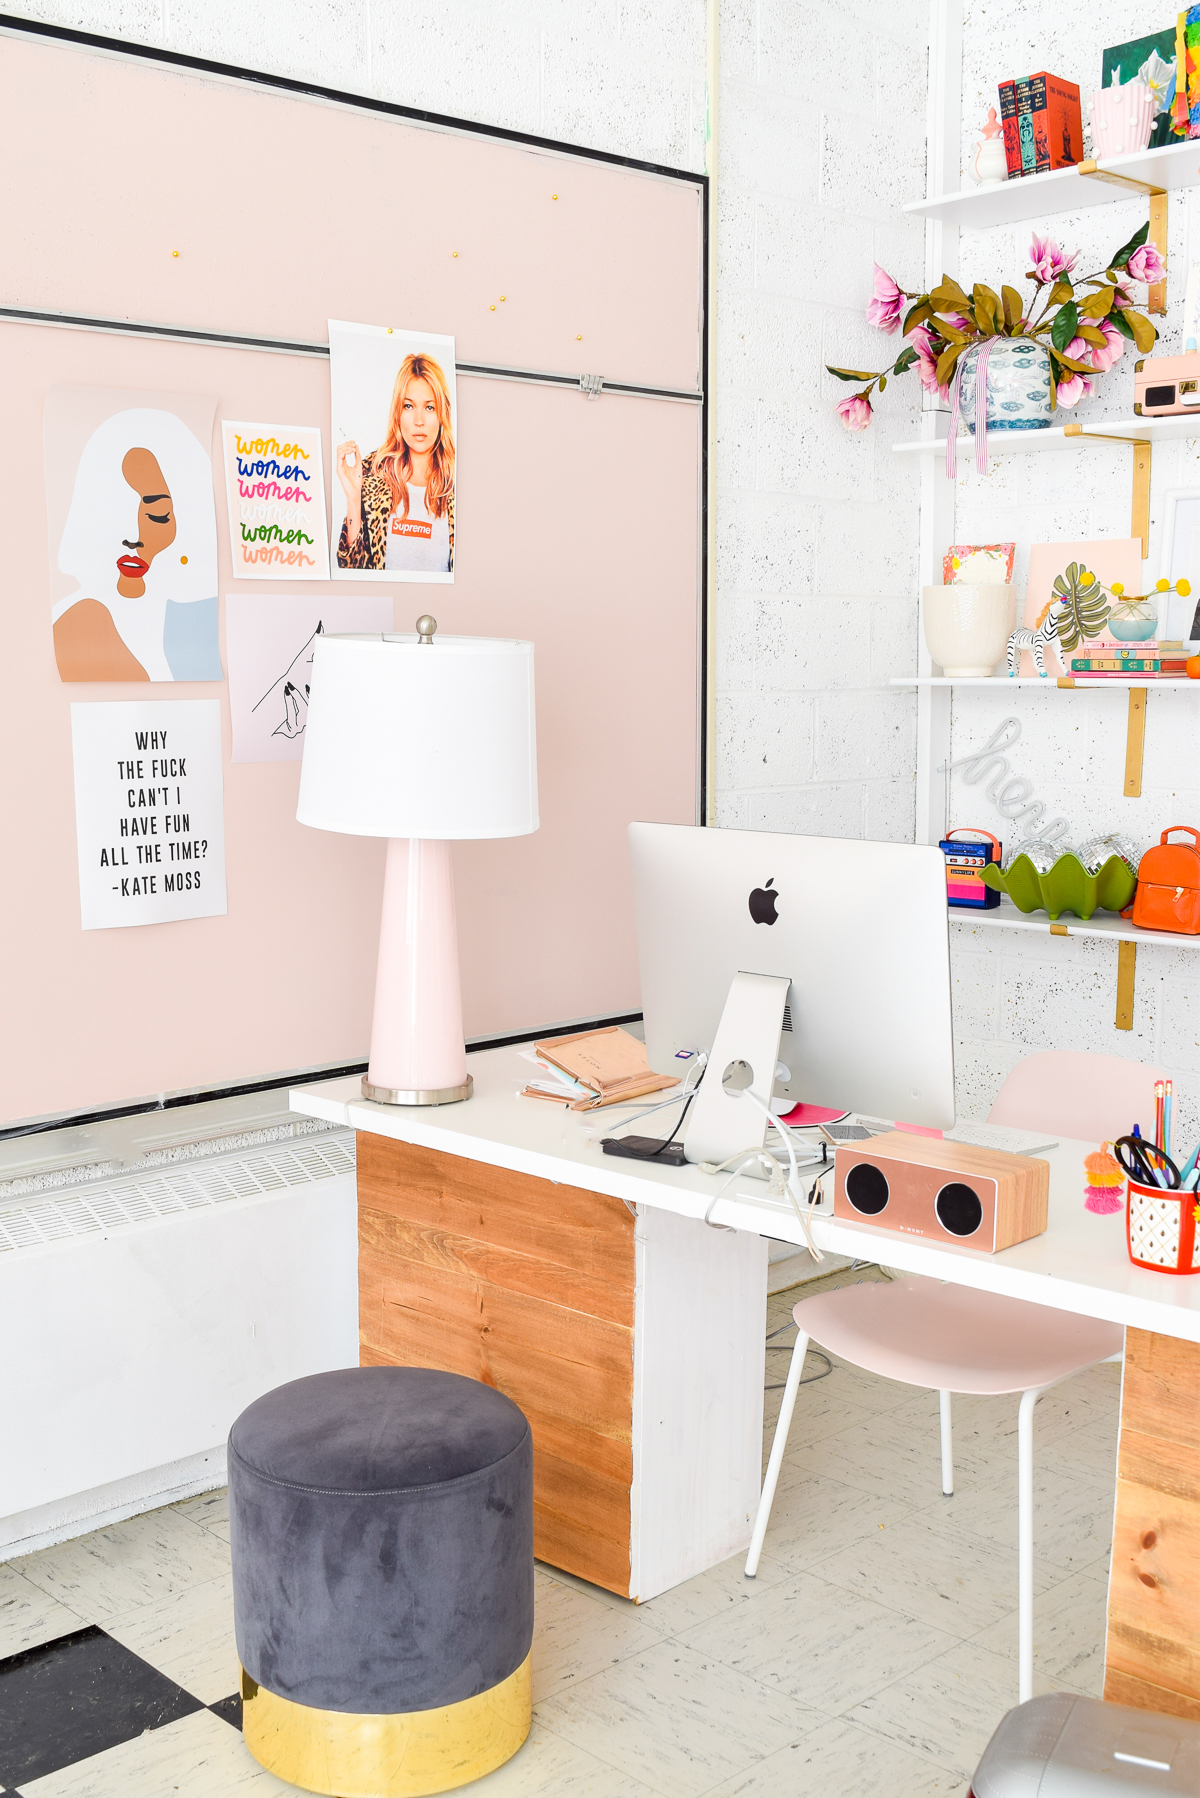 side shot of a desk next to a pink chalkboard